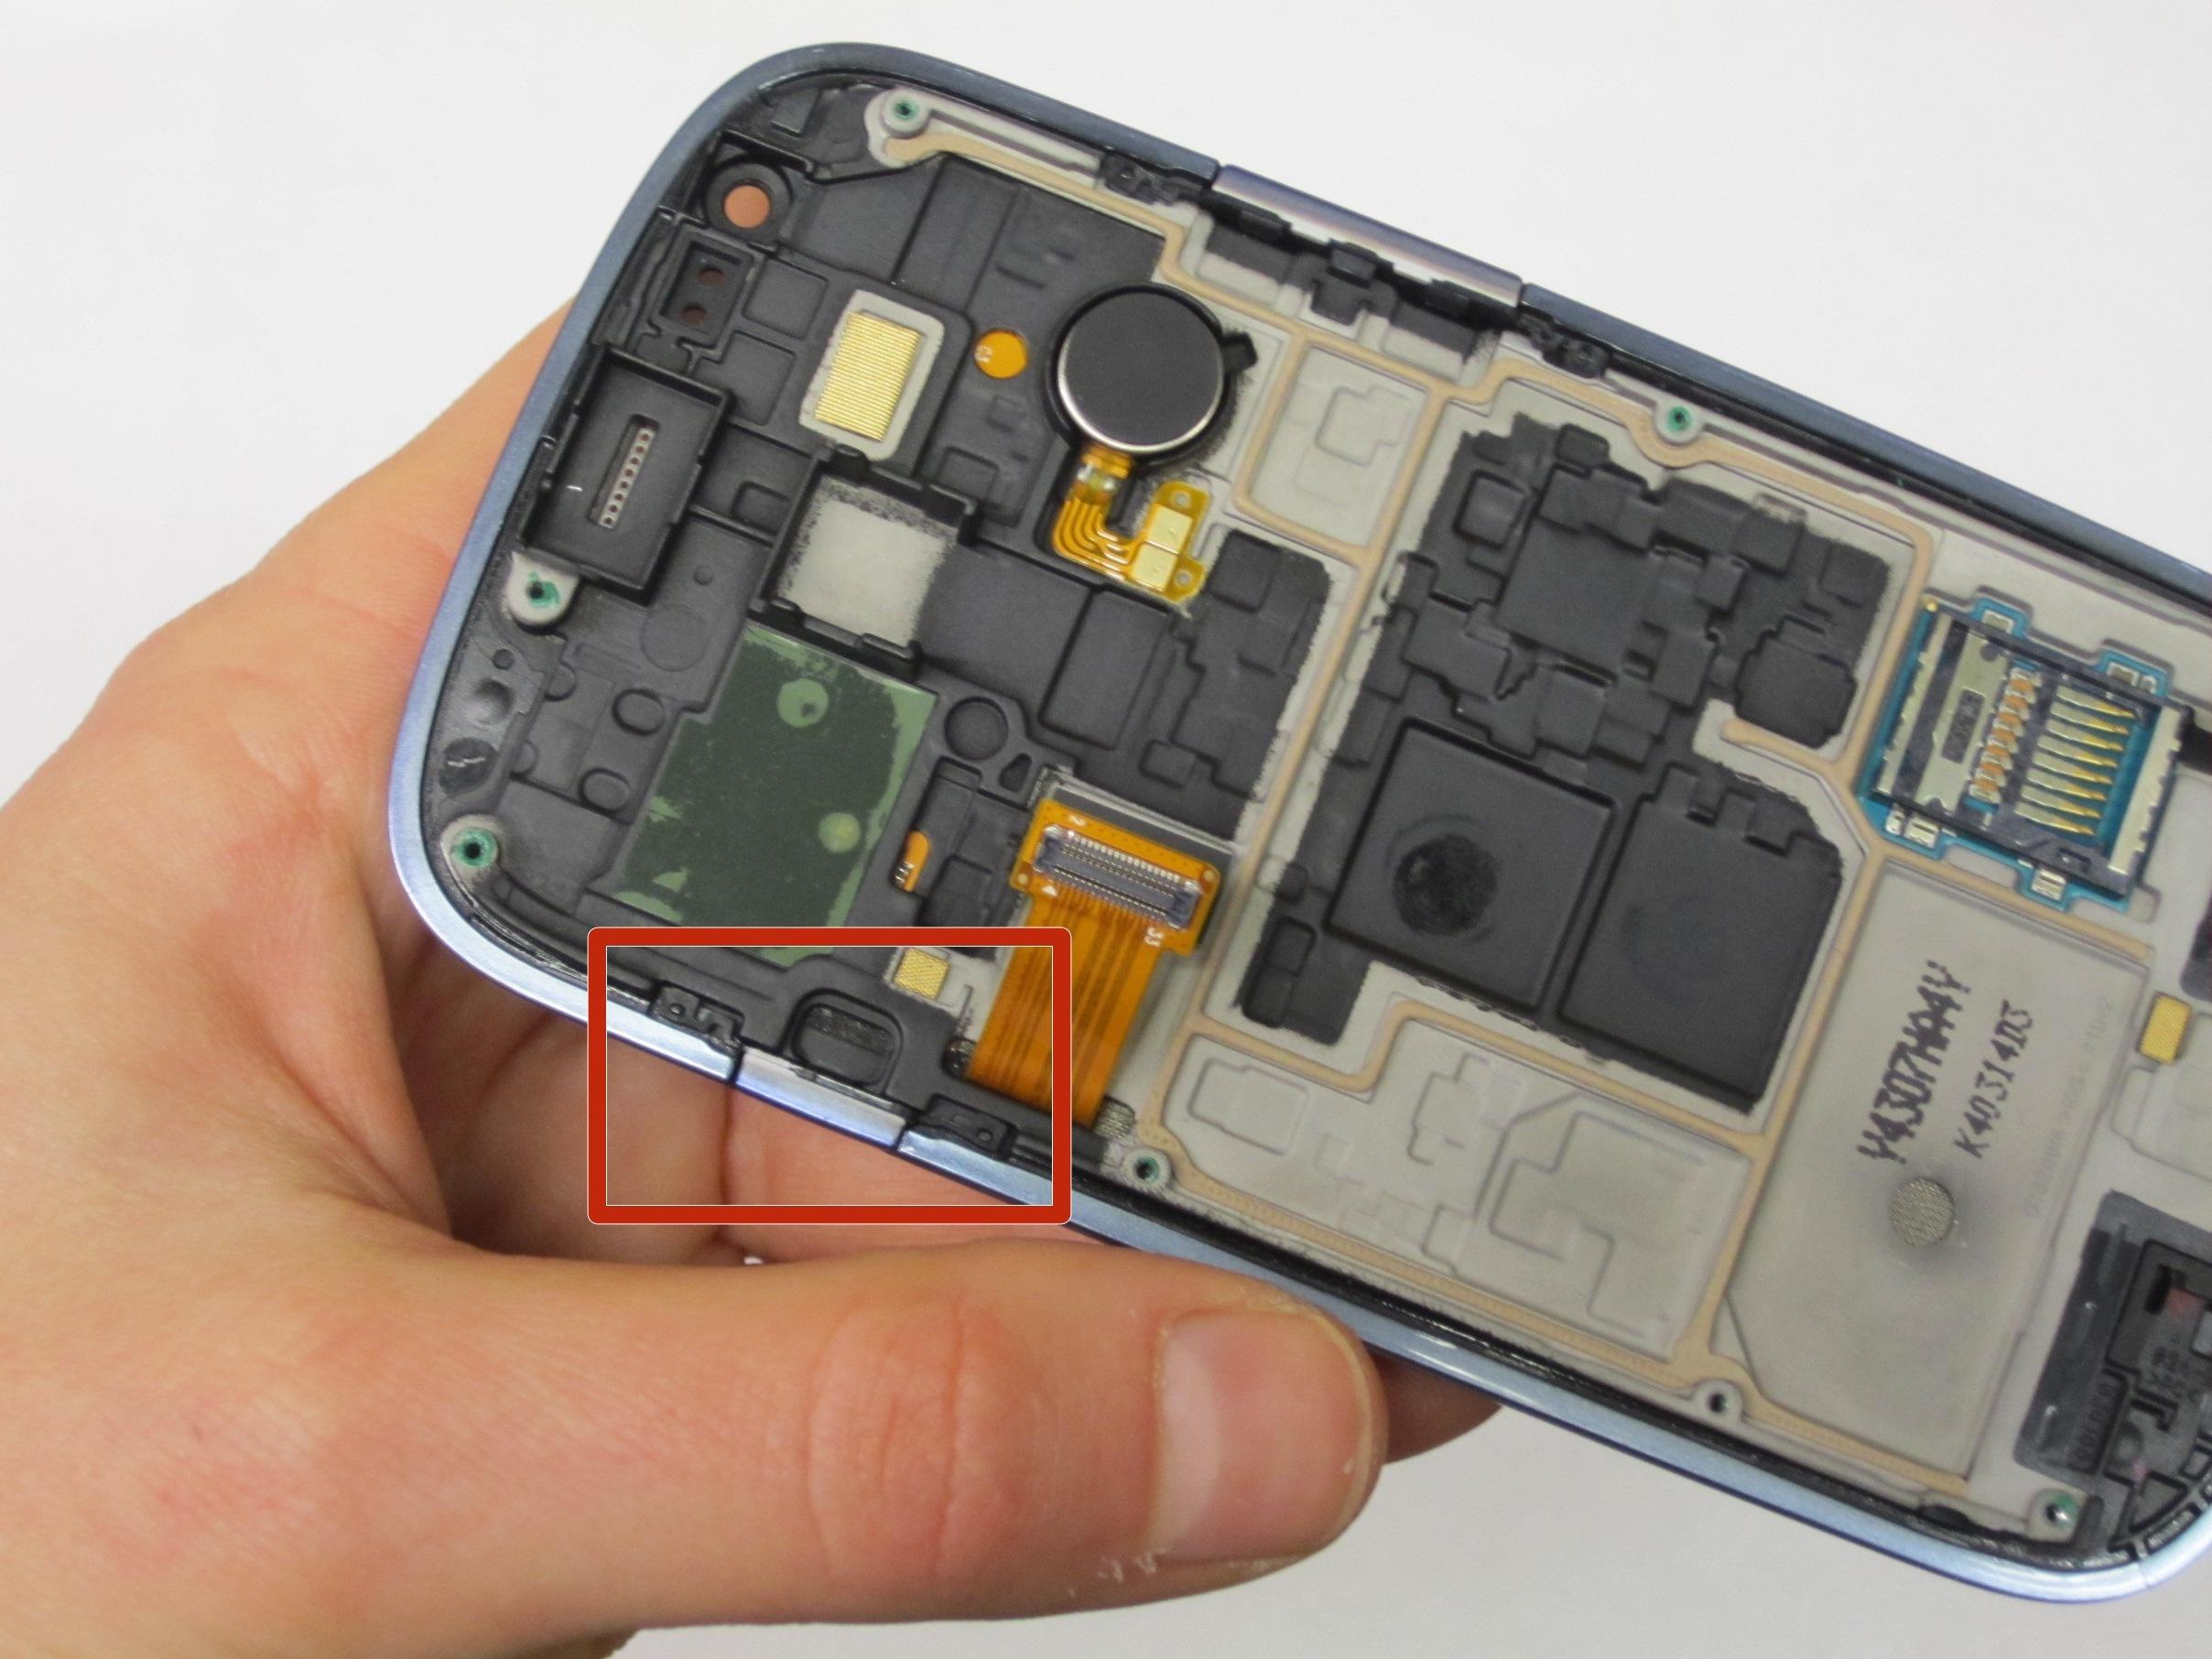 Samsung galaxy s3 mini i8190 power button ways - Samsung Galaxy S3 Mini I8190 Power Button Ways 7